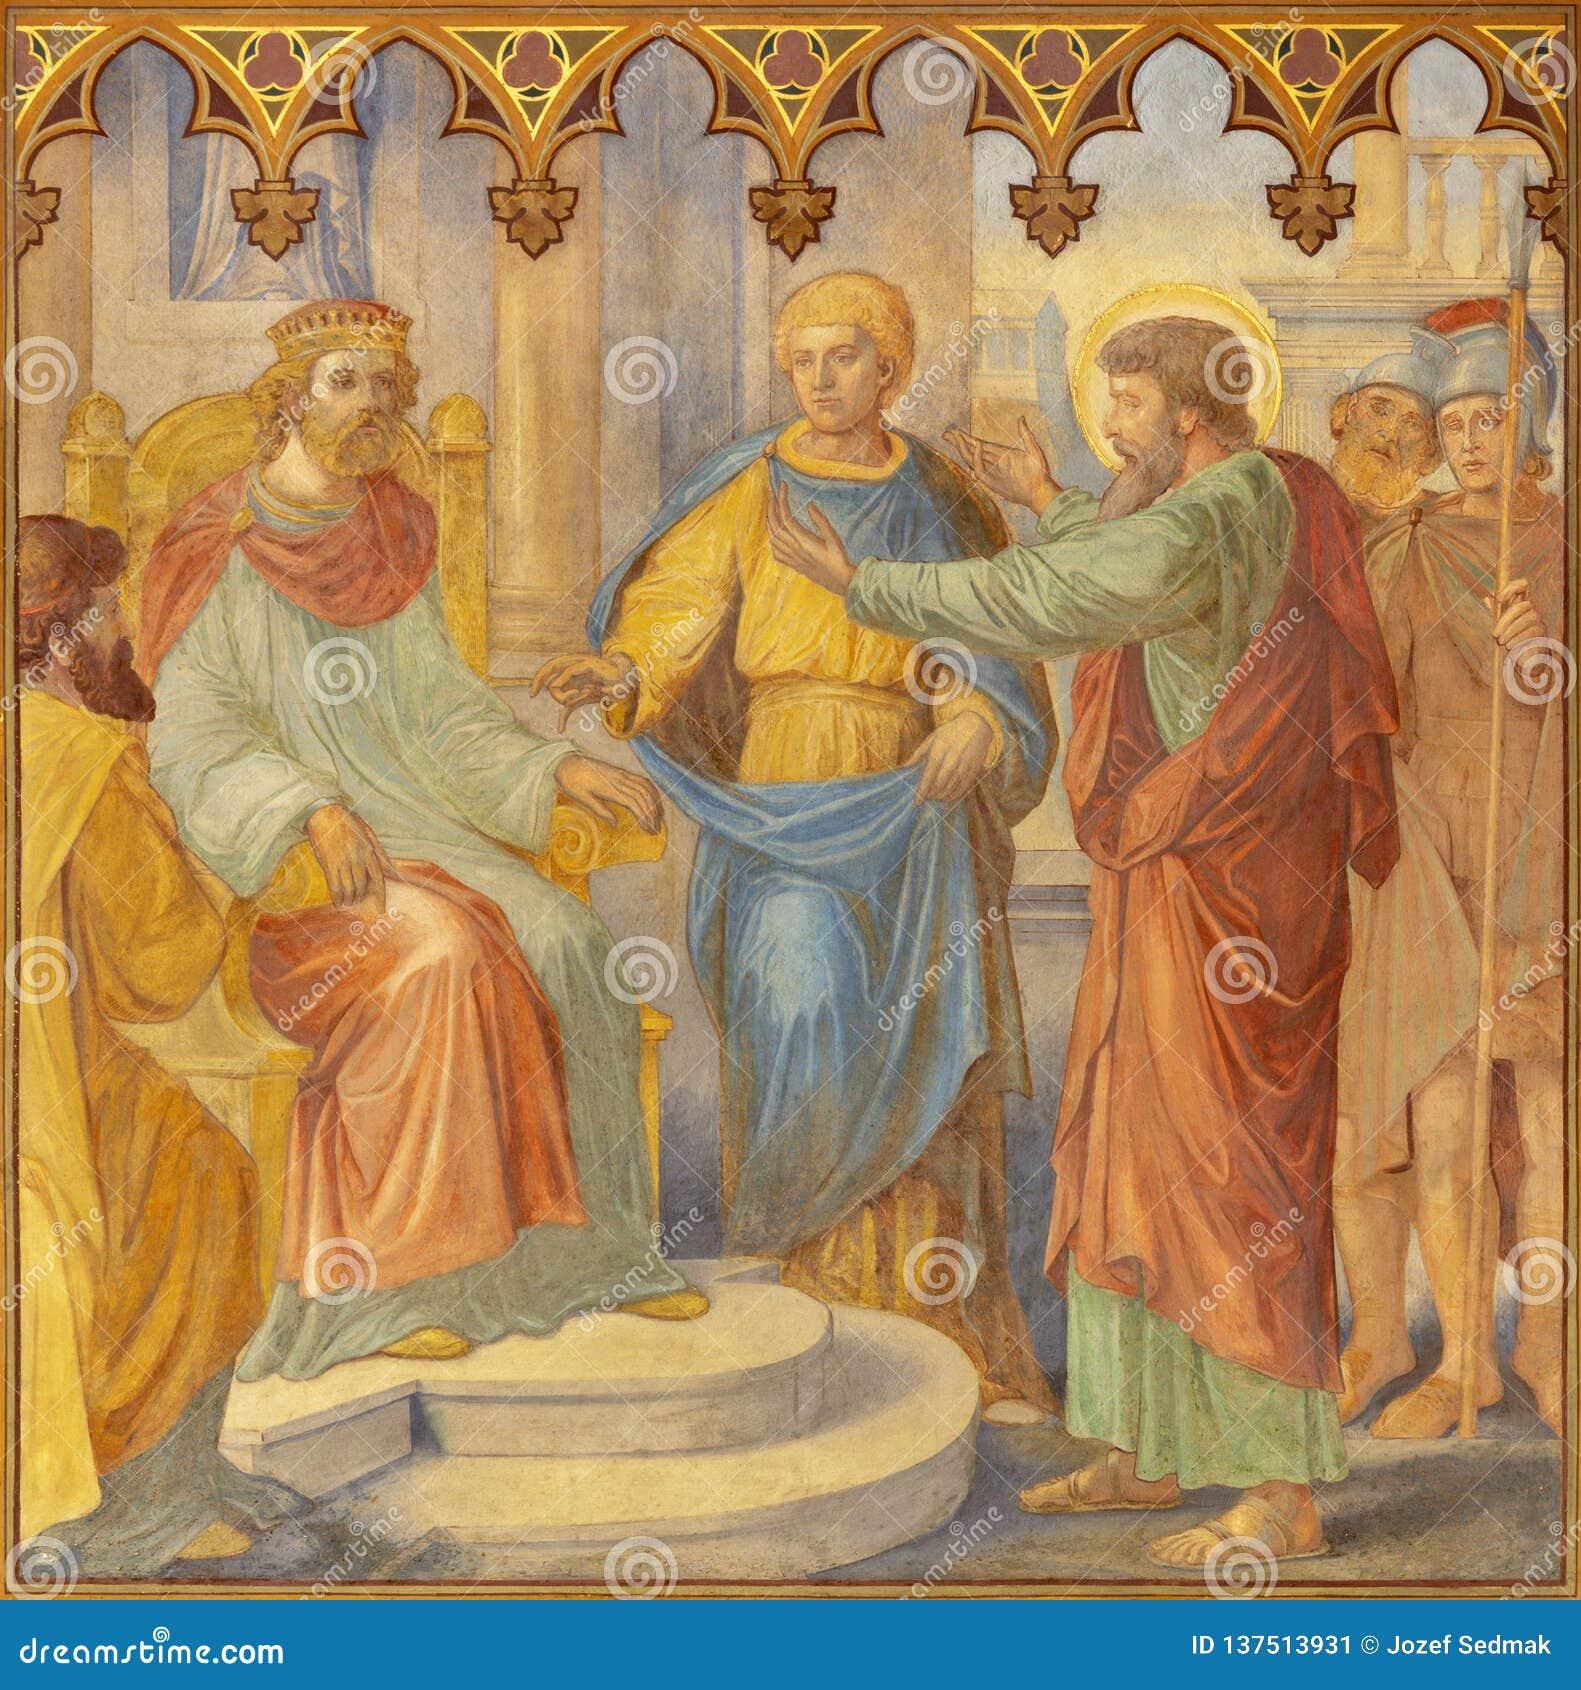 PRAGUE, CZECH REPUBLIC - OCTOBER 15, 2018: The fresco judgment of St. Paul before Agripa in church Bazilika svatého Petra a Pavla